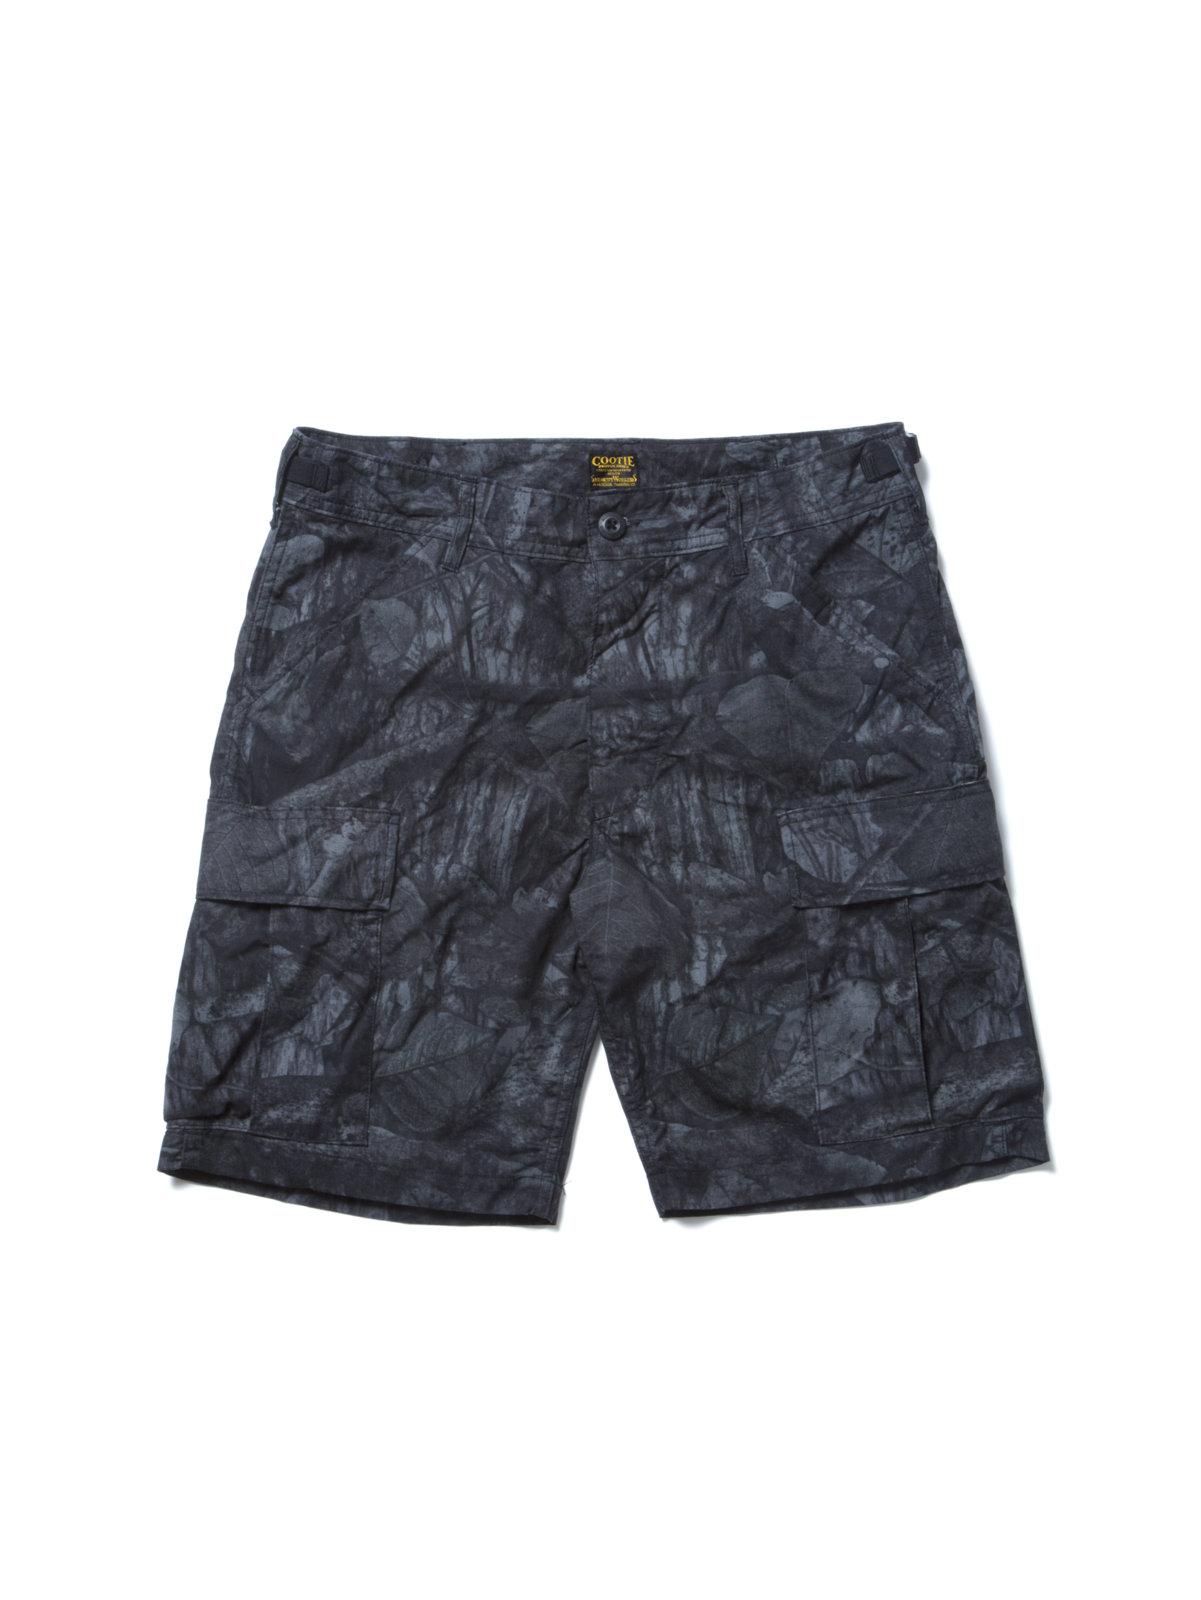 Killer Trap Cargo Shorts-Black-